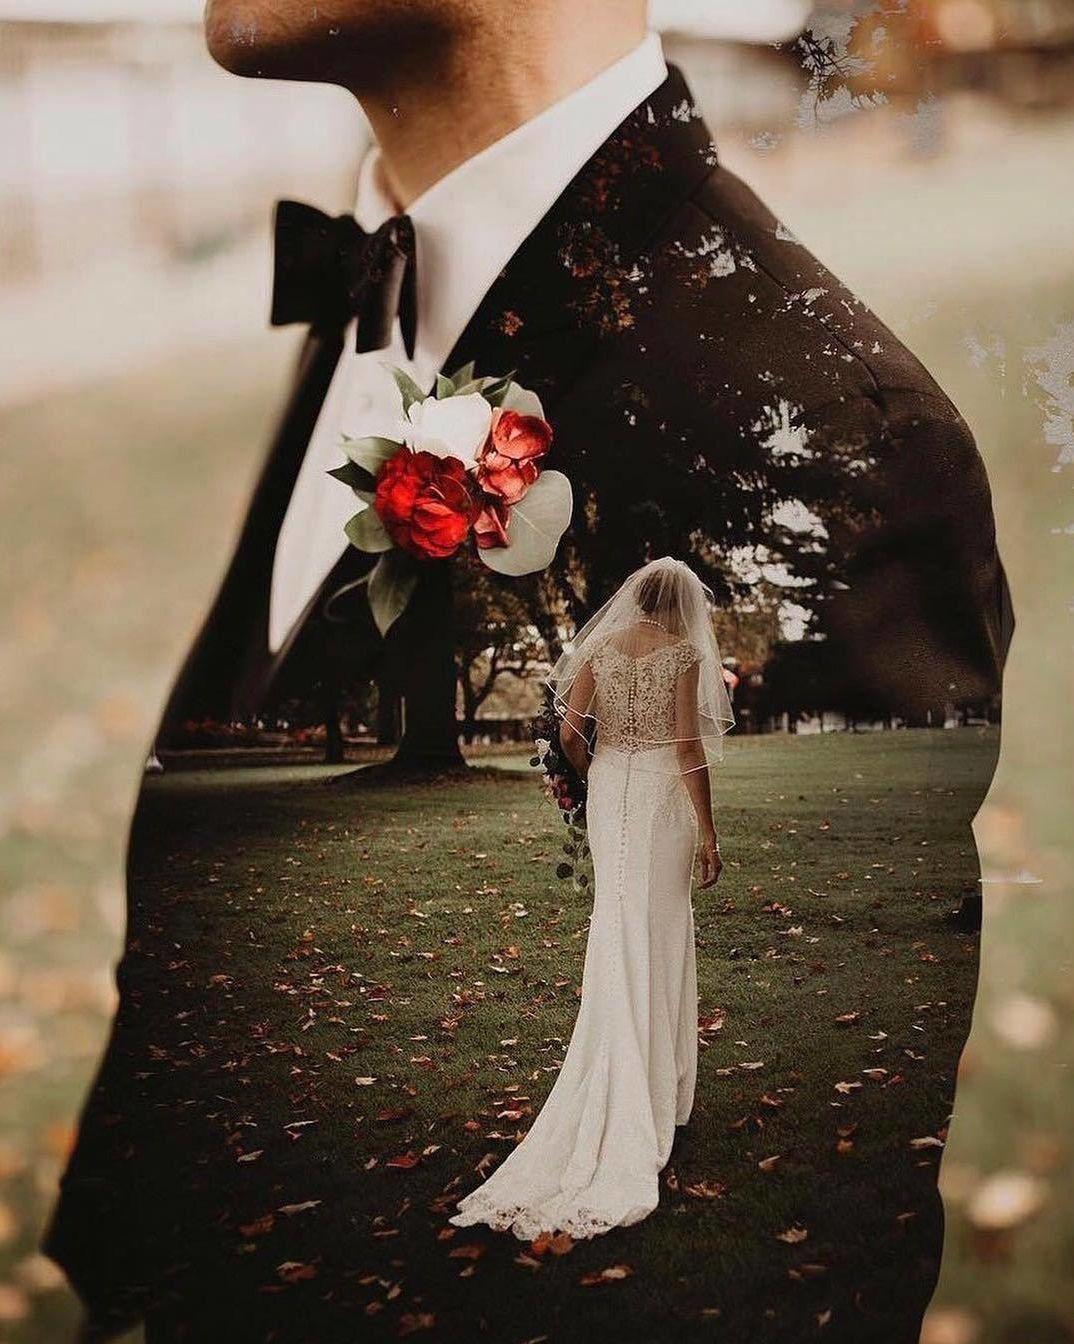 Indian Bridesmaid Gowns Wedding Bride Weddings 1000 In 2020 Creative Wedding Photography Wedding Photo Inspiration Wedding Photography Poses